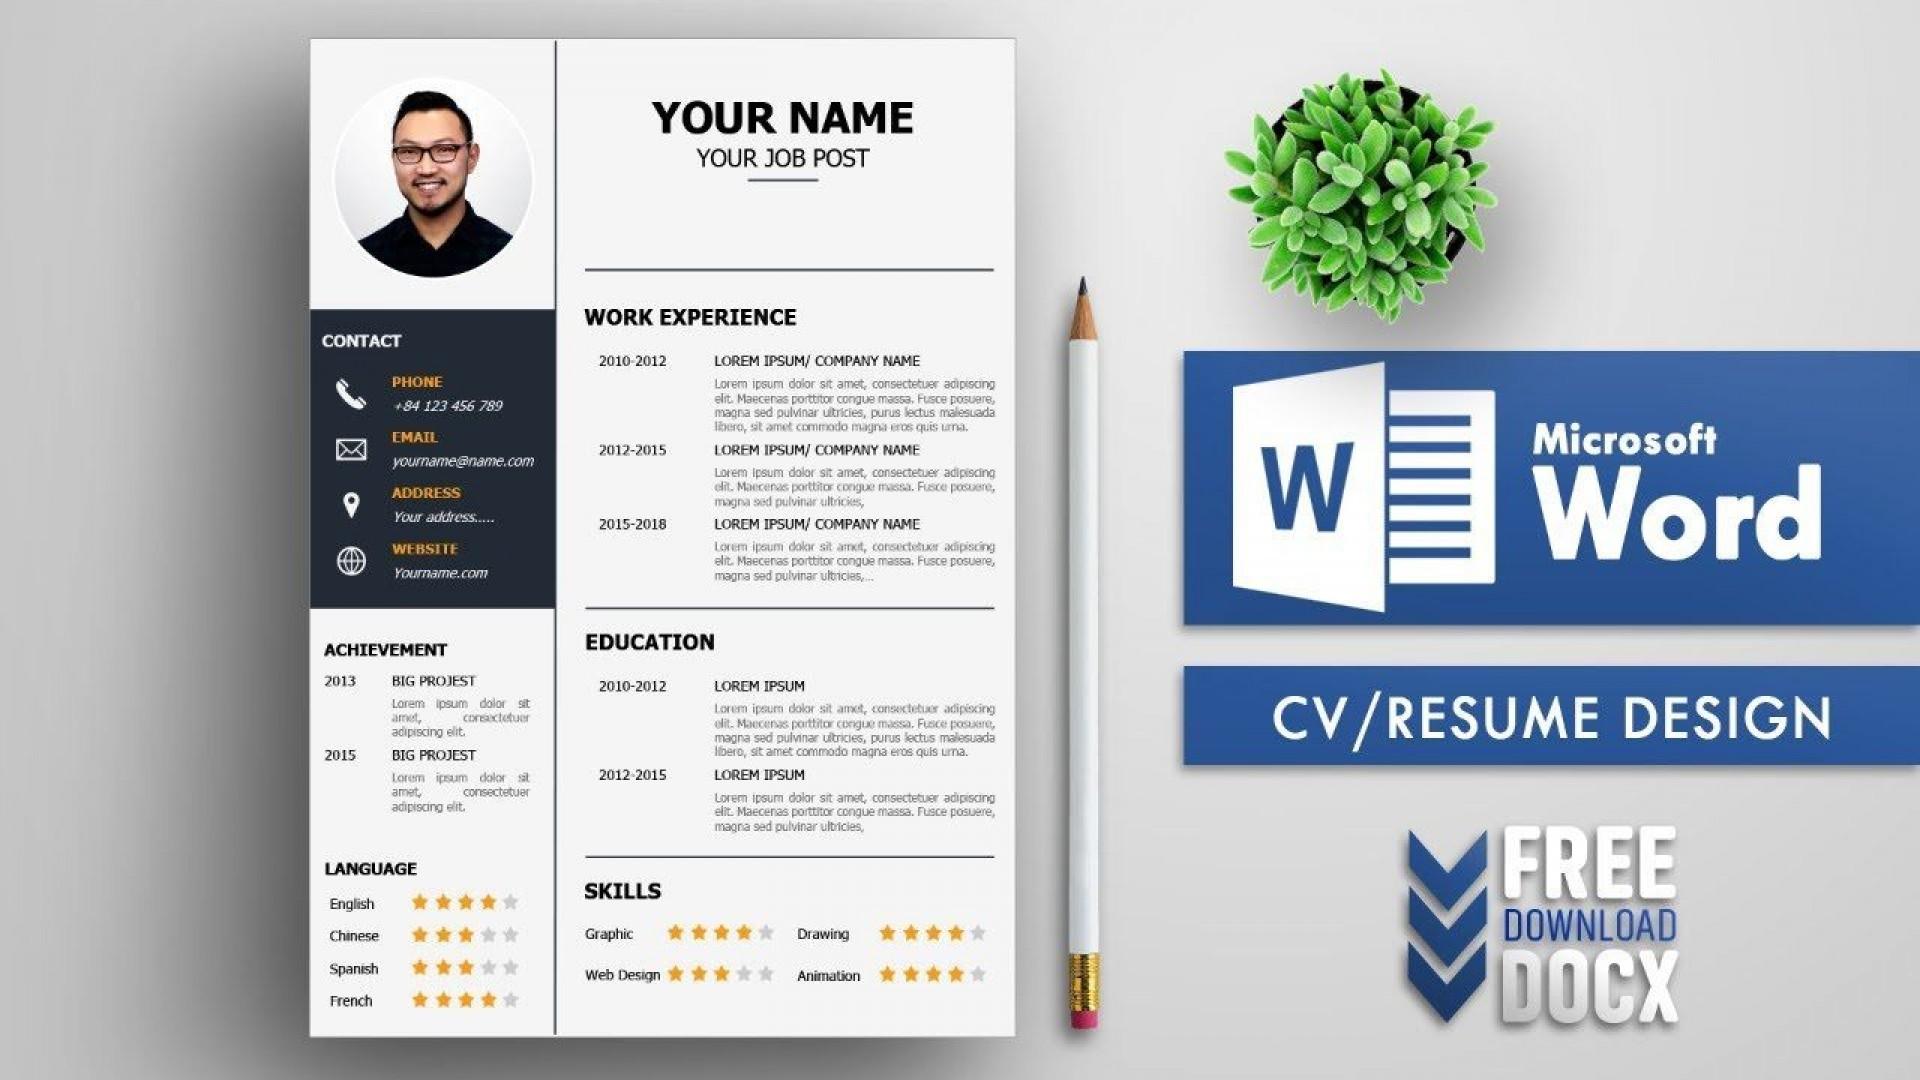 005 Shocking Curriculum Vitae Template Free Word Example  Sample Format Microsoft Cv Download1920